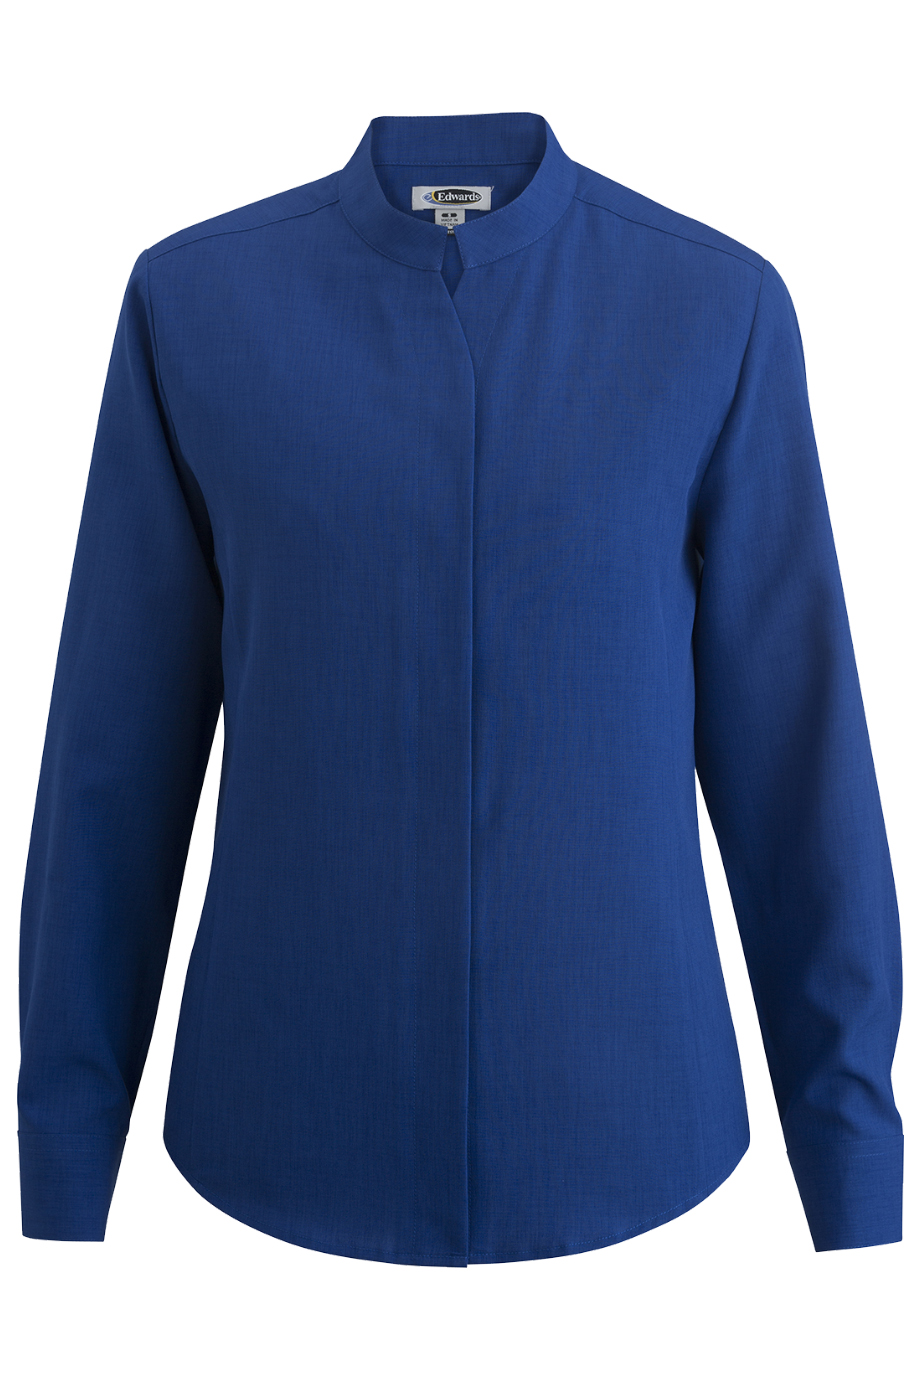 Ladies' Stand-Up Collar Shirt 5398